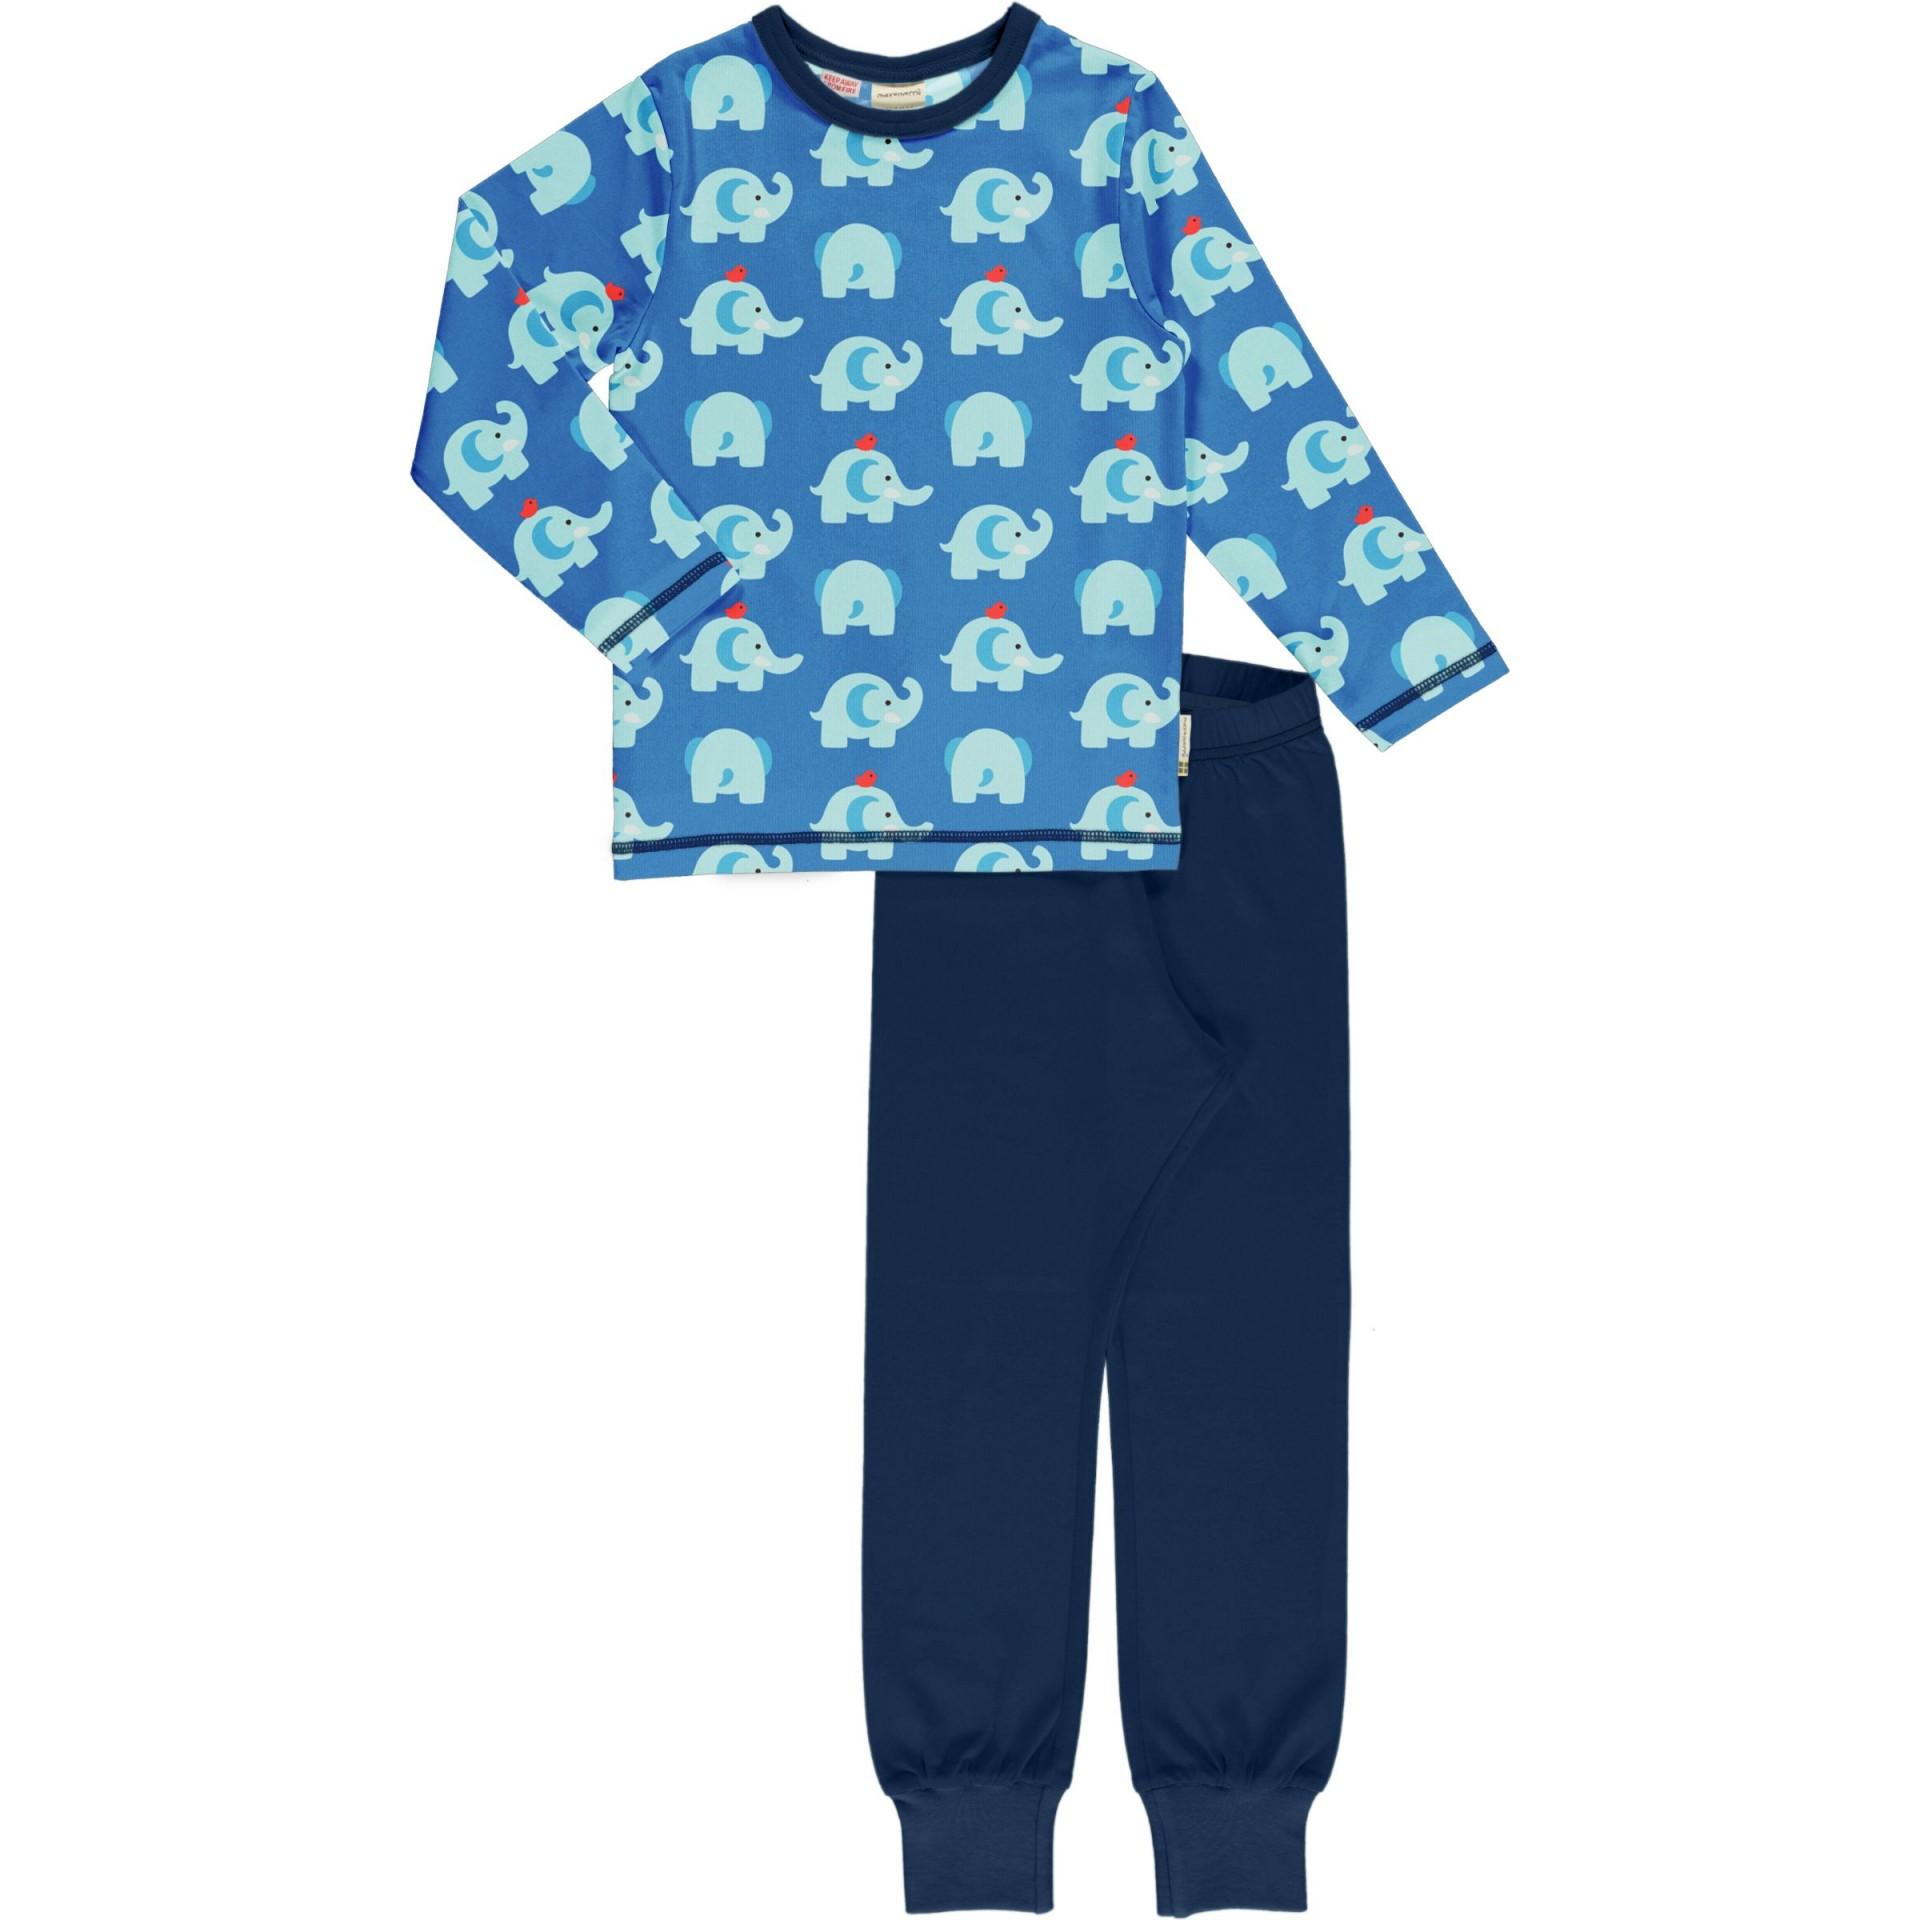 Pijama ELEPHANT FRIENDS Maxomorra (Tamanhos disponíveis 9-12 m, 18-24m )